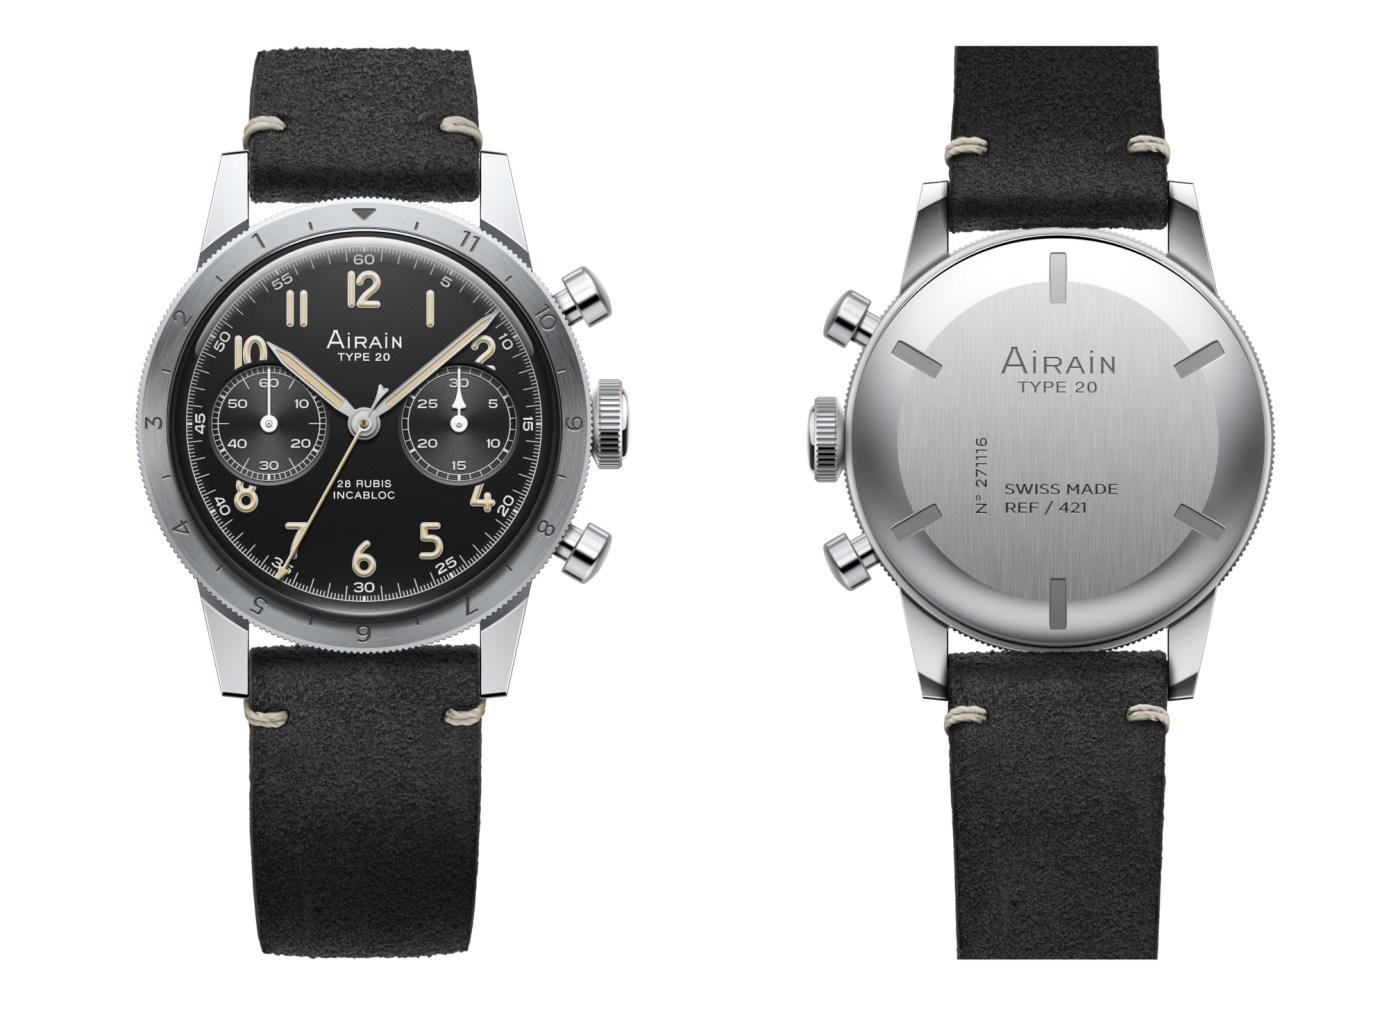 Airain Type 20 Re-Edition